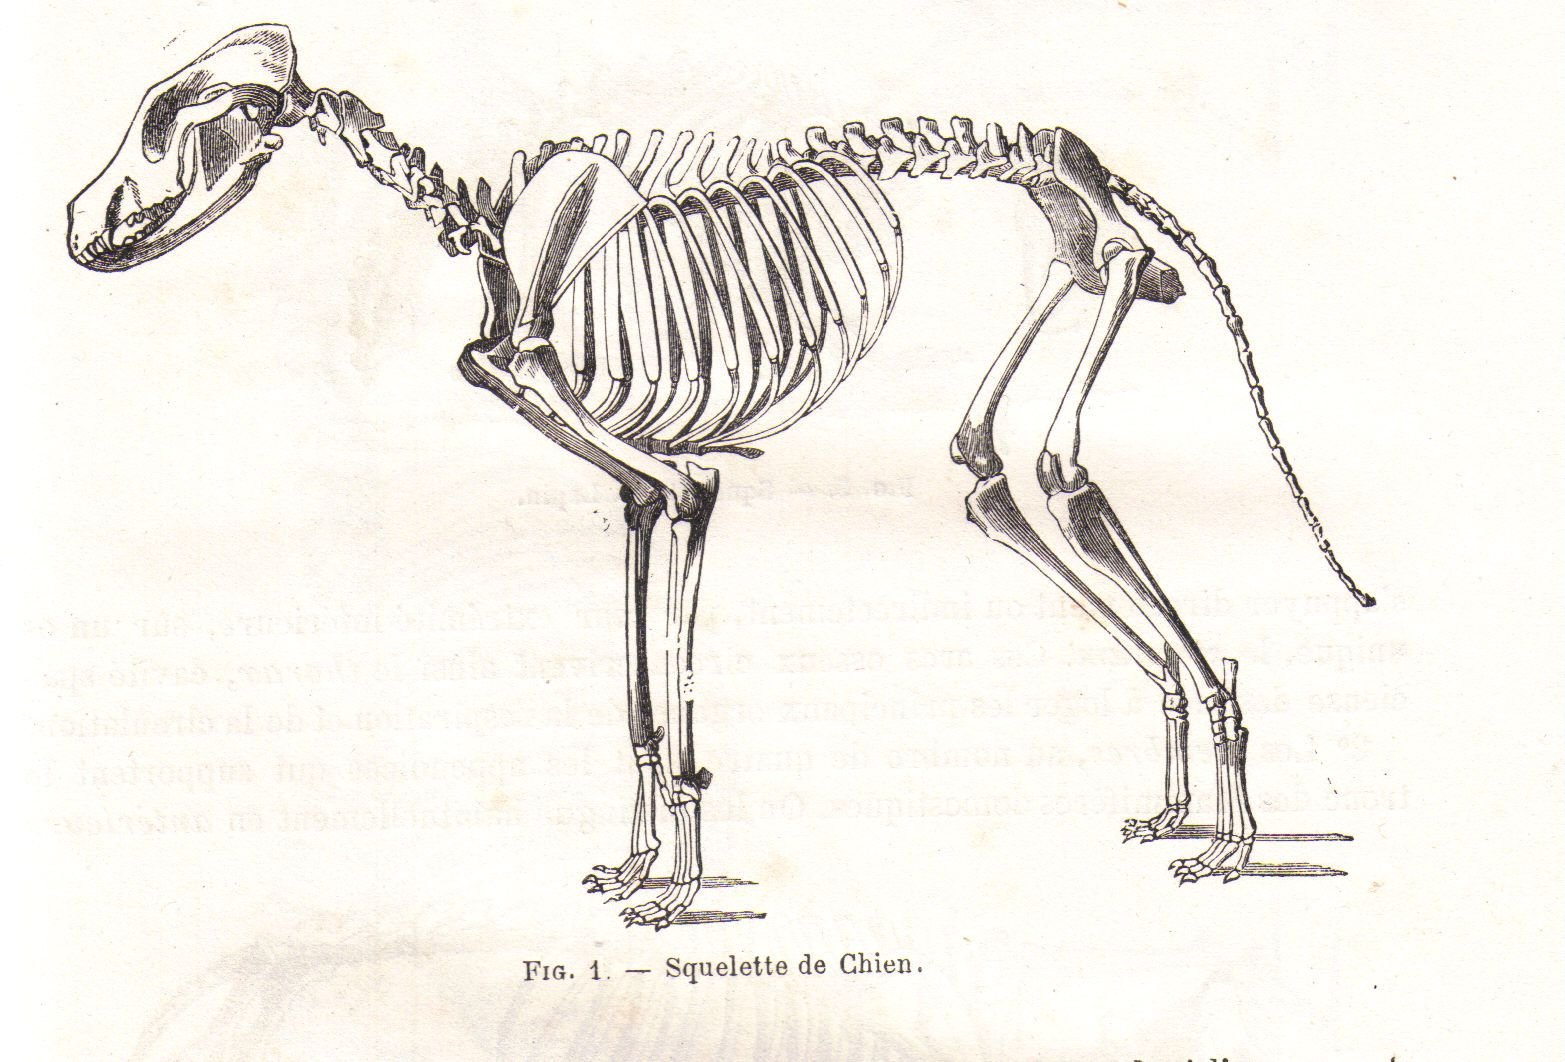 File Squelettechienchauveau1990 Jpg Wikimedia Commons